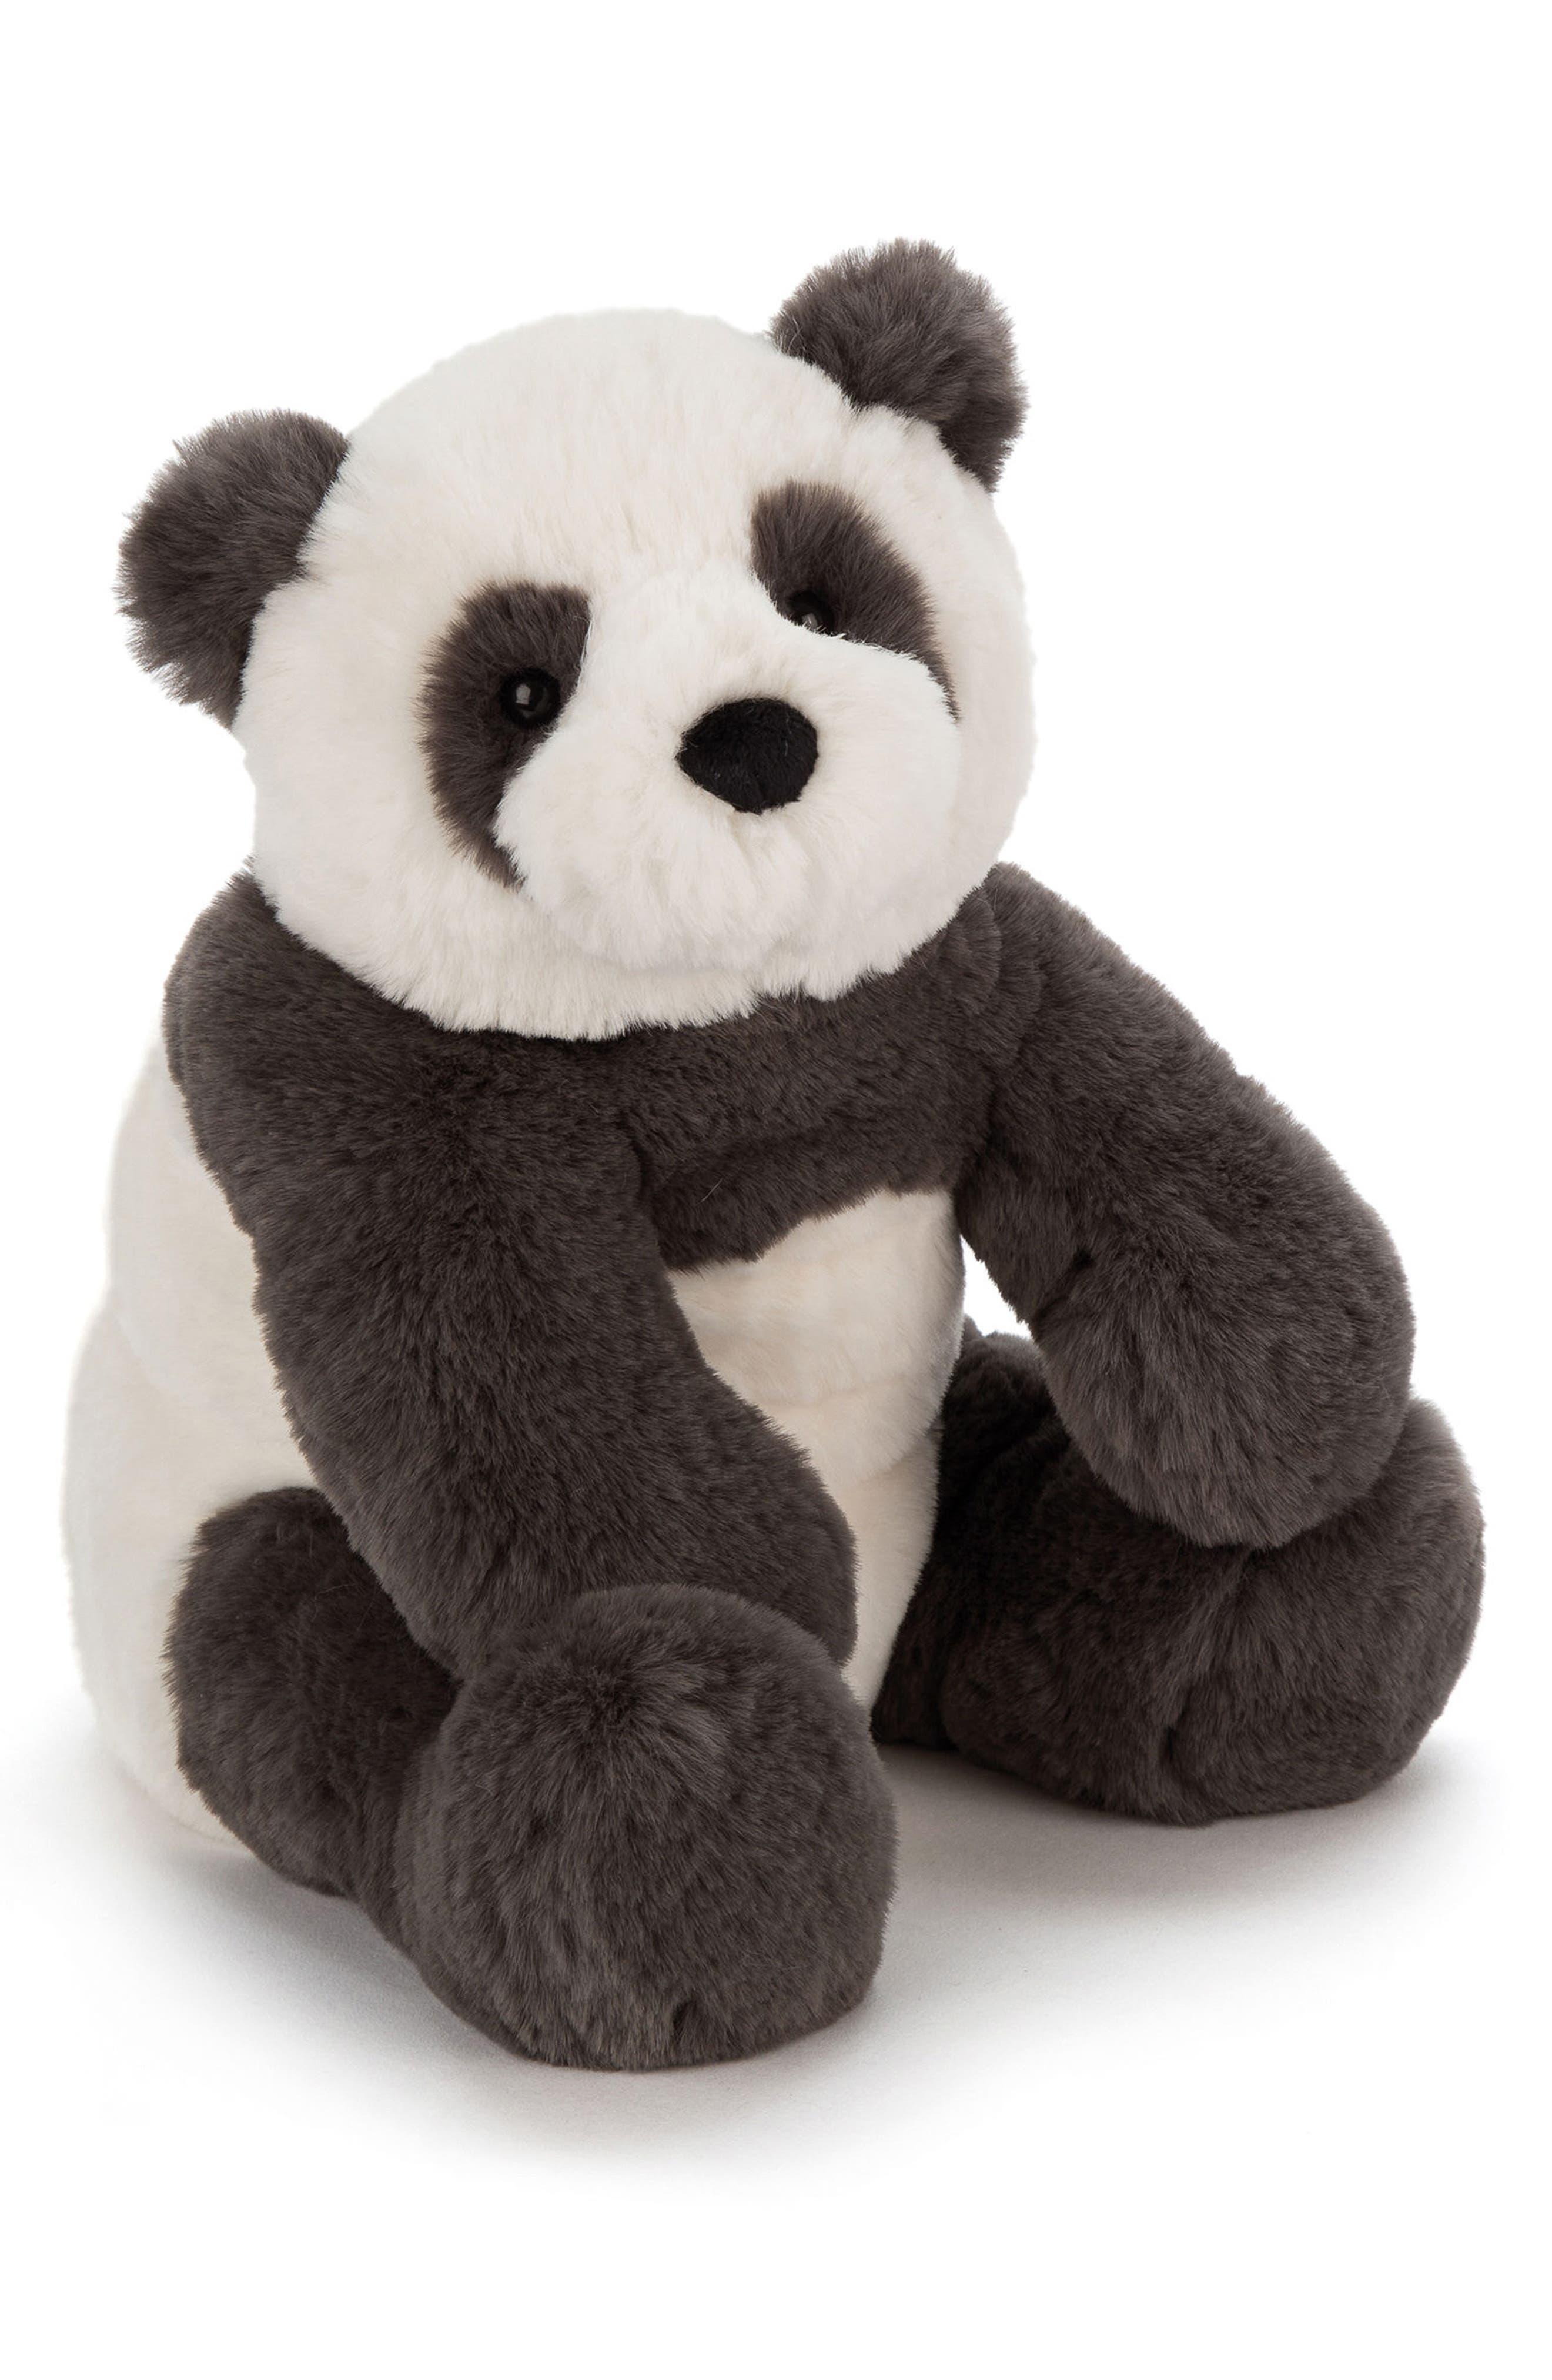 Little Harry Panda Stuffed Animal,                             Main thumbnail 1, color,                             BLACK / CREAM